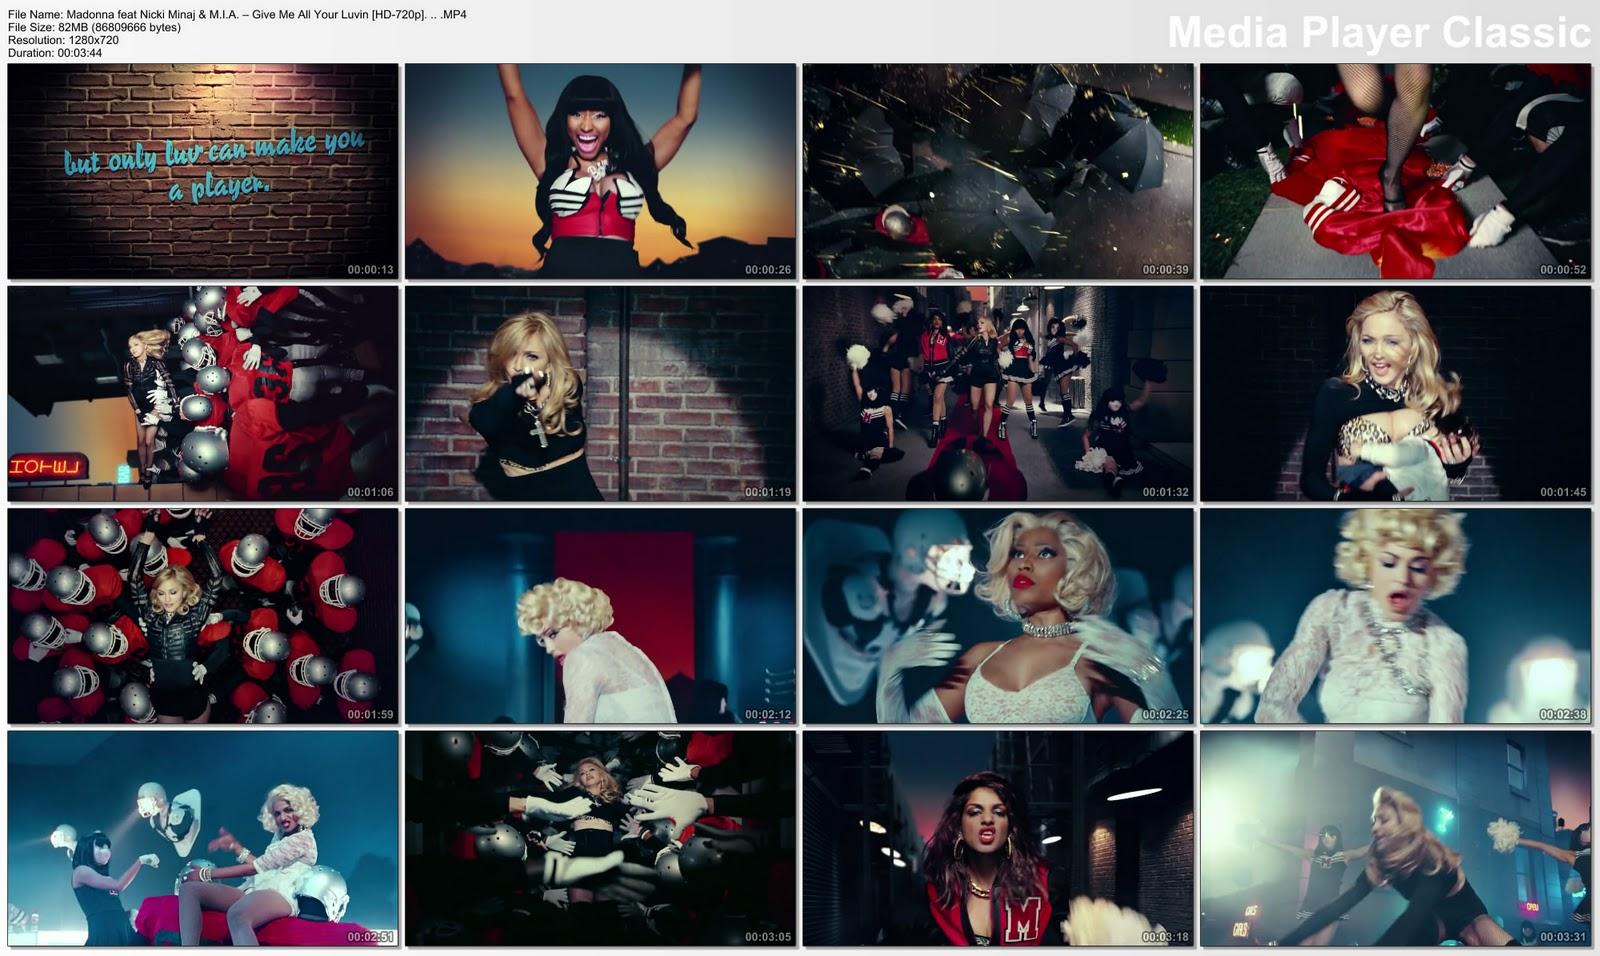 http://2.bp.blogspot.com/-ptqNHKbvQzQ/Tyv5XZMX_QI/AAAAAAAAAmk/8Sx7oG_USkM/s1600/Madonna+feat+Nicki+Minaj+&+M.I.A.+%E2%80%93+Give+Me+All+Your+Luvin+%5BHD-720p%5D.+%7BMobicareg%7D..%7BHKRG%7D+.MP4_thumbs_%5B2012.02.03_20.41.35%5D.jpg